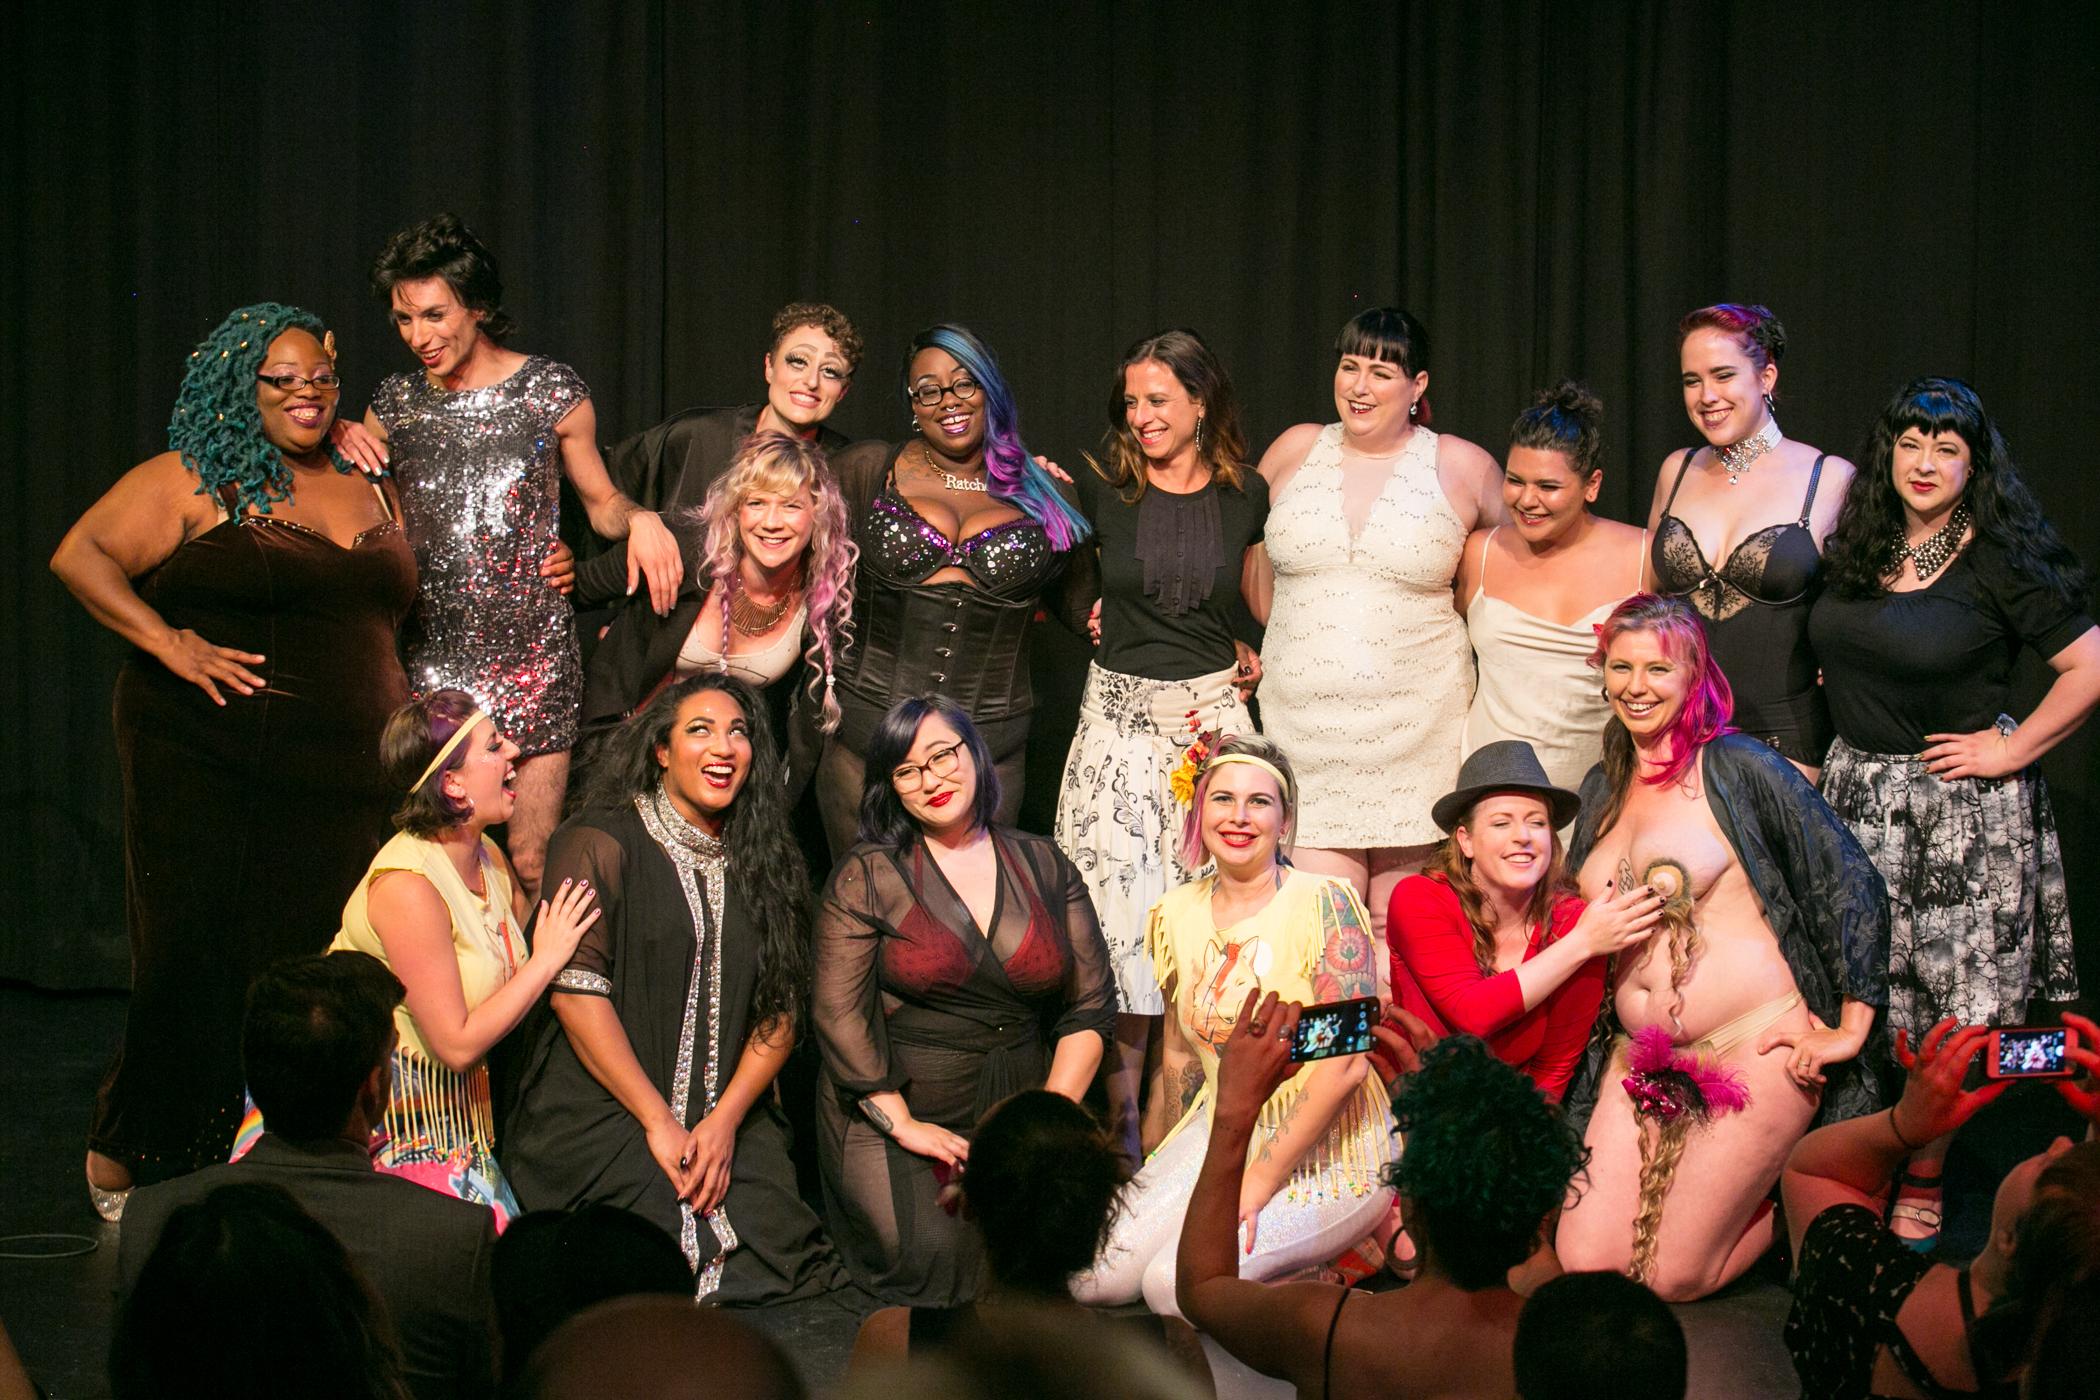 July 2017 Show – San Francisco